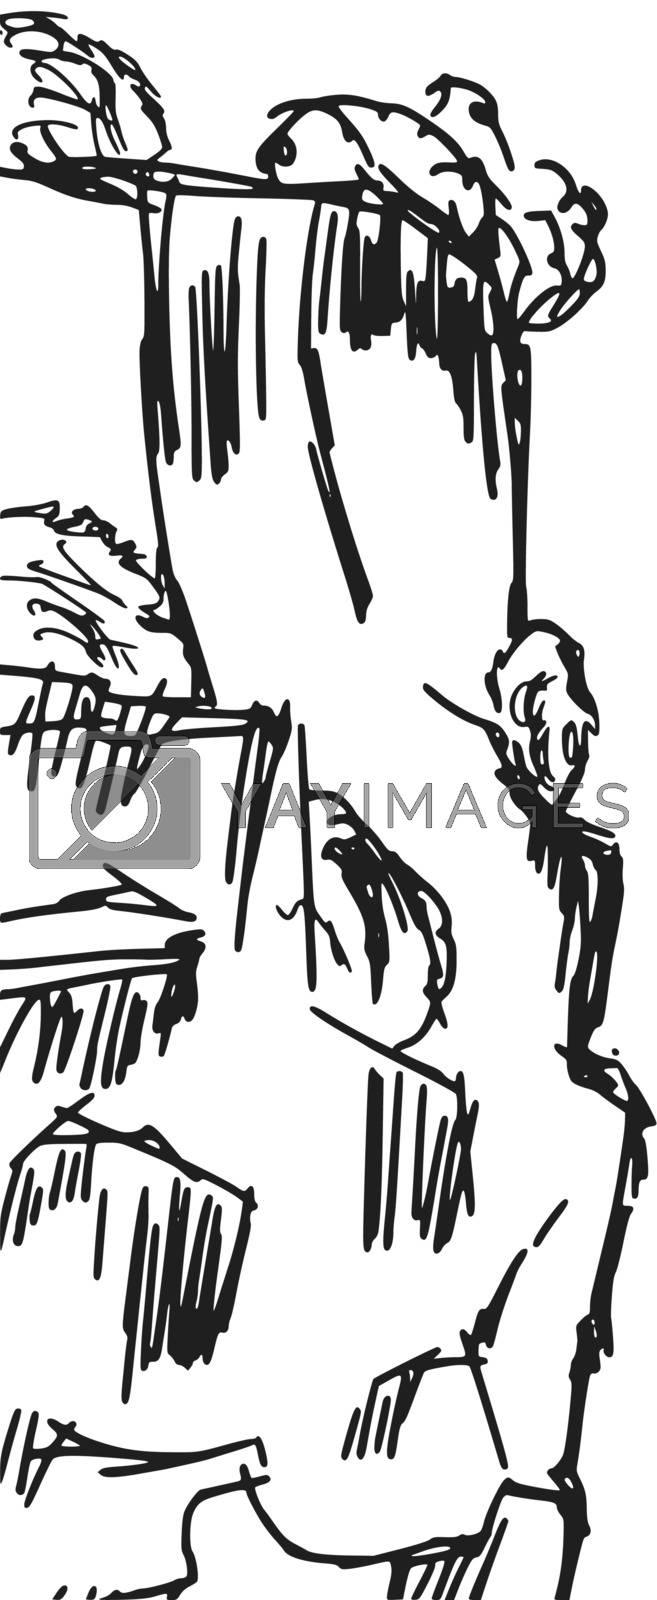 hand drawn, sketch, cartoon illustration of cliff